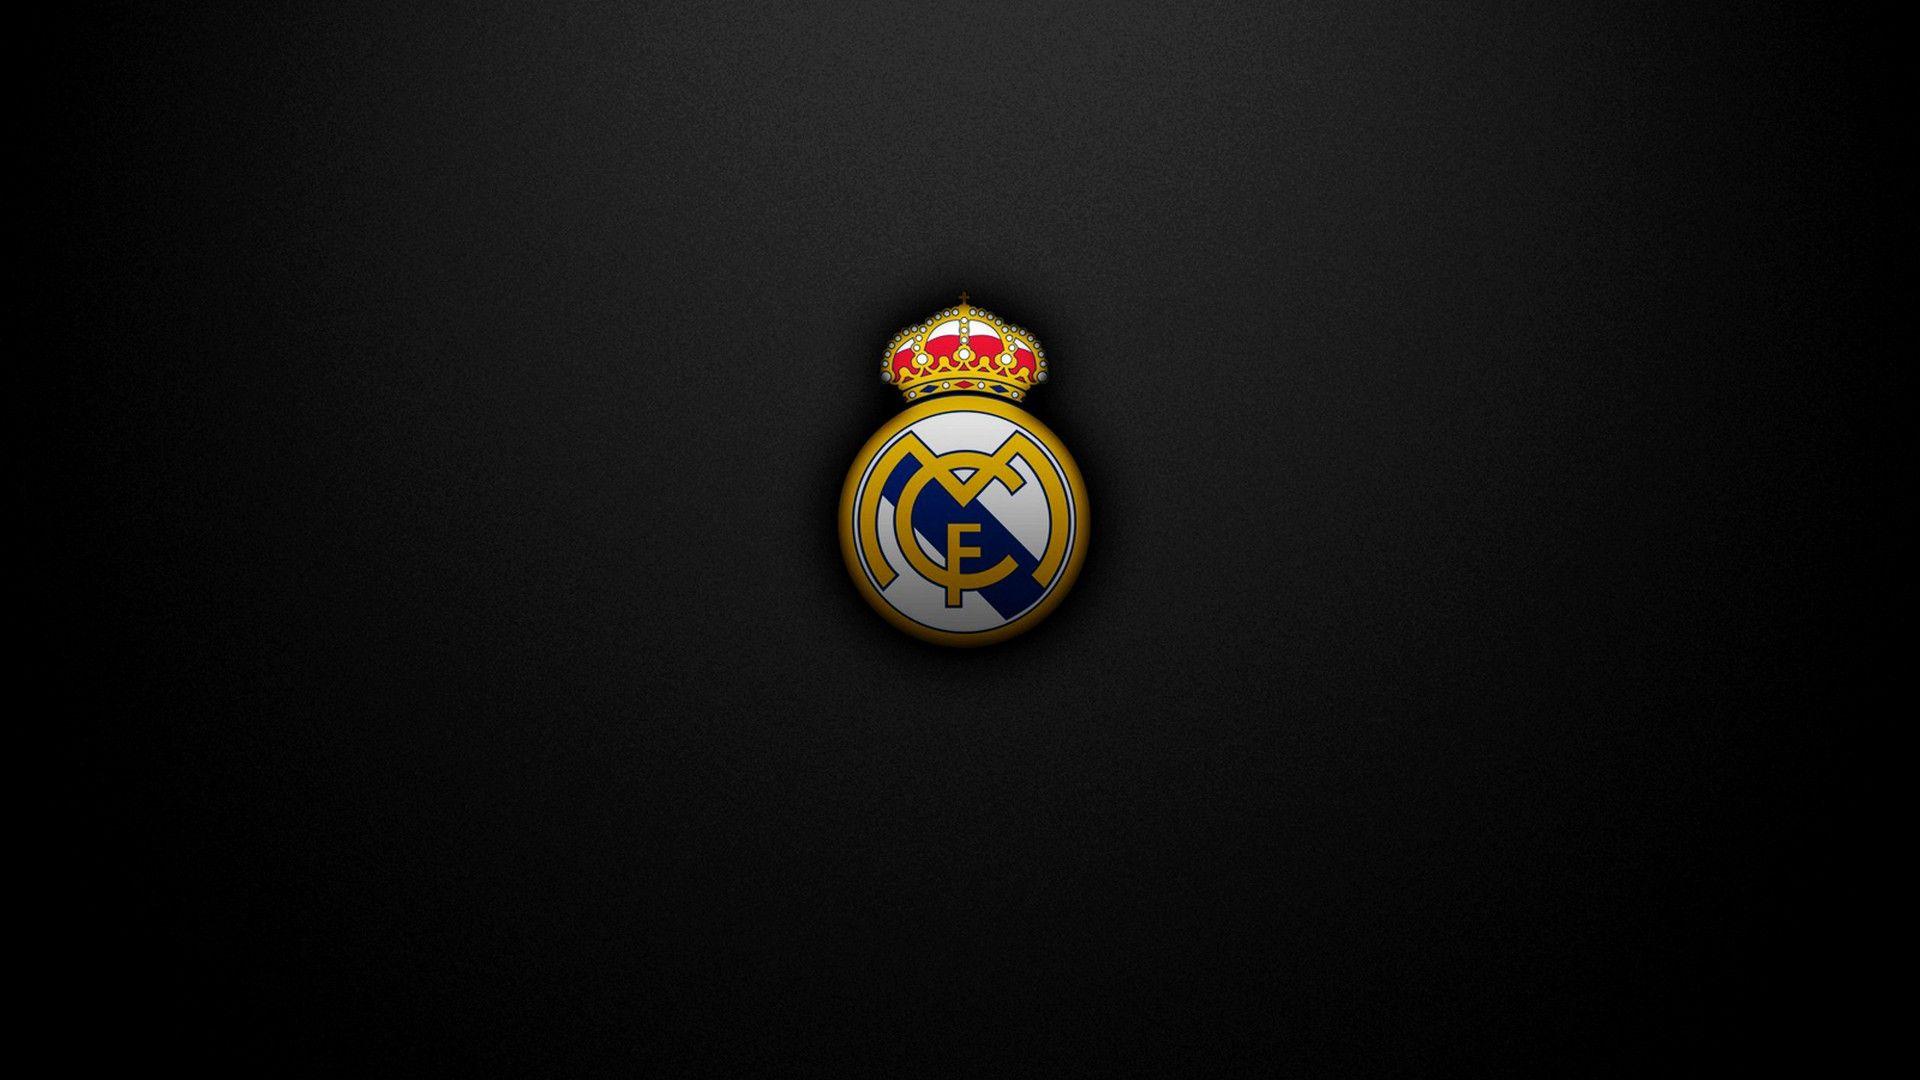 Hd Backgrounds Real Madrid 1080p Futebol